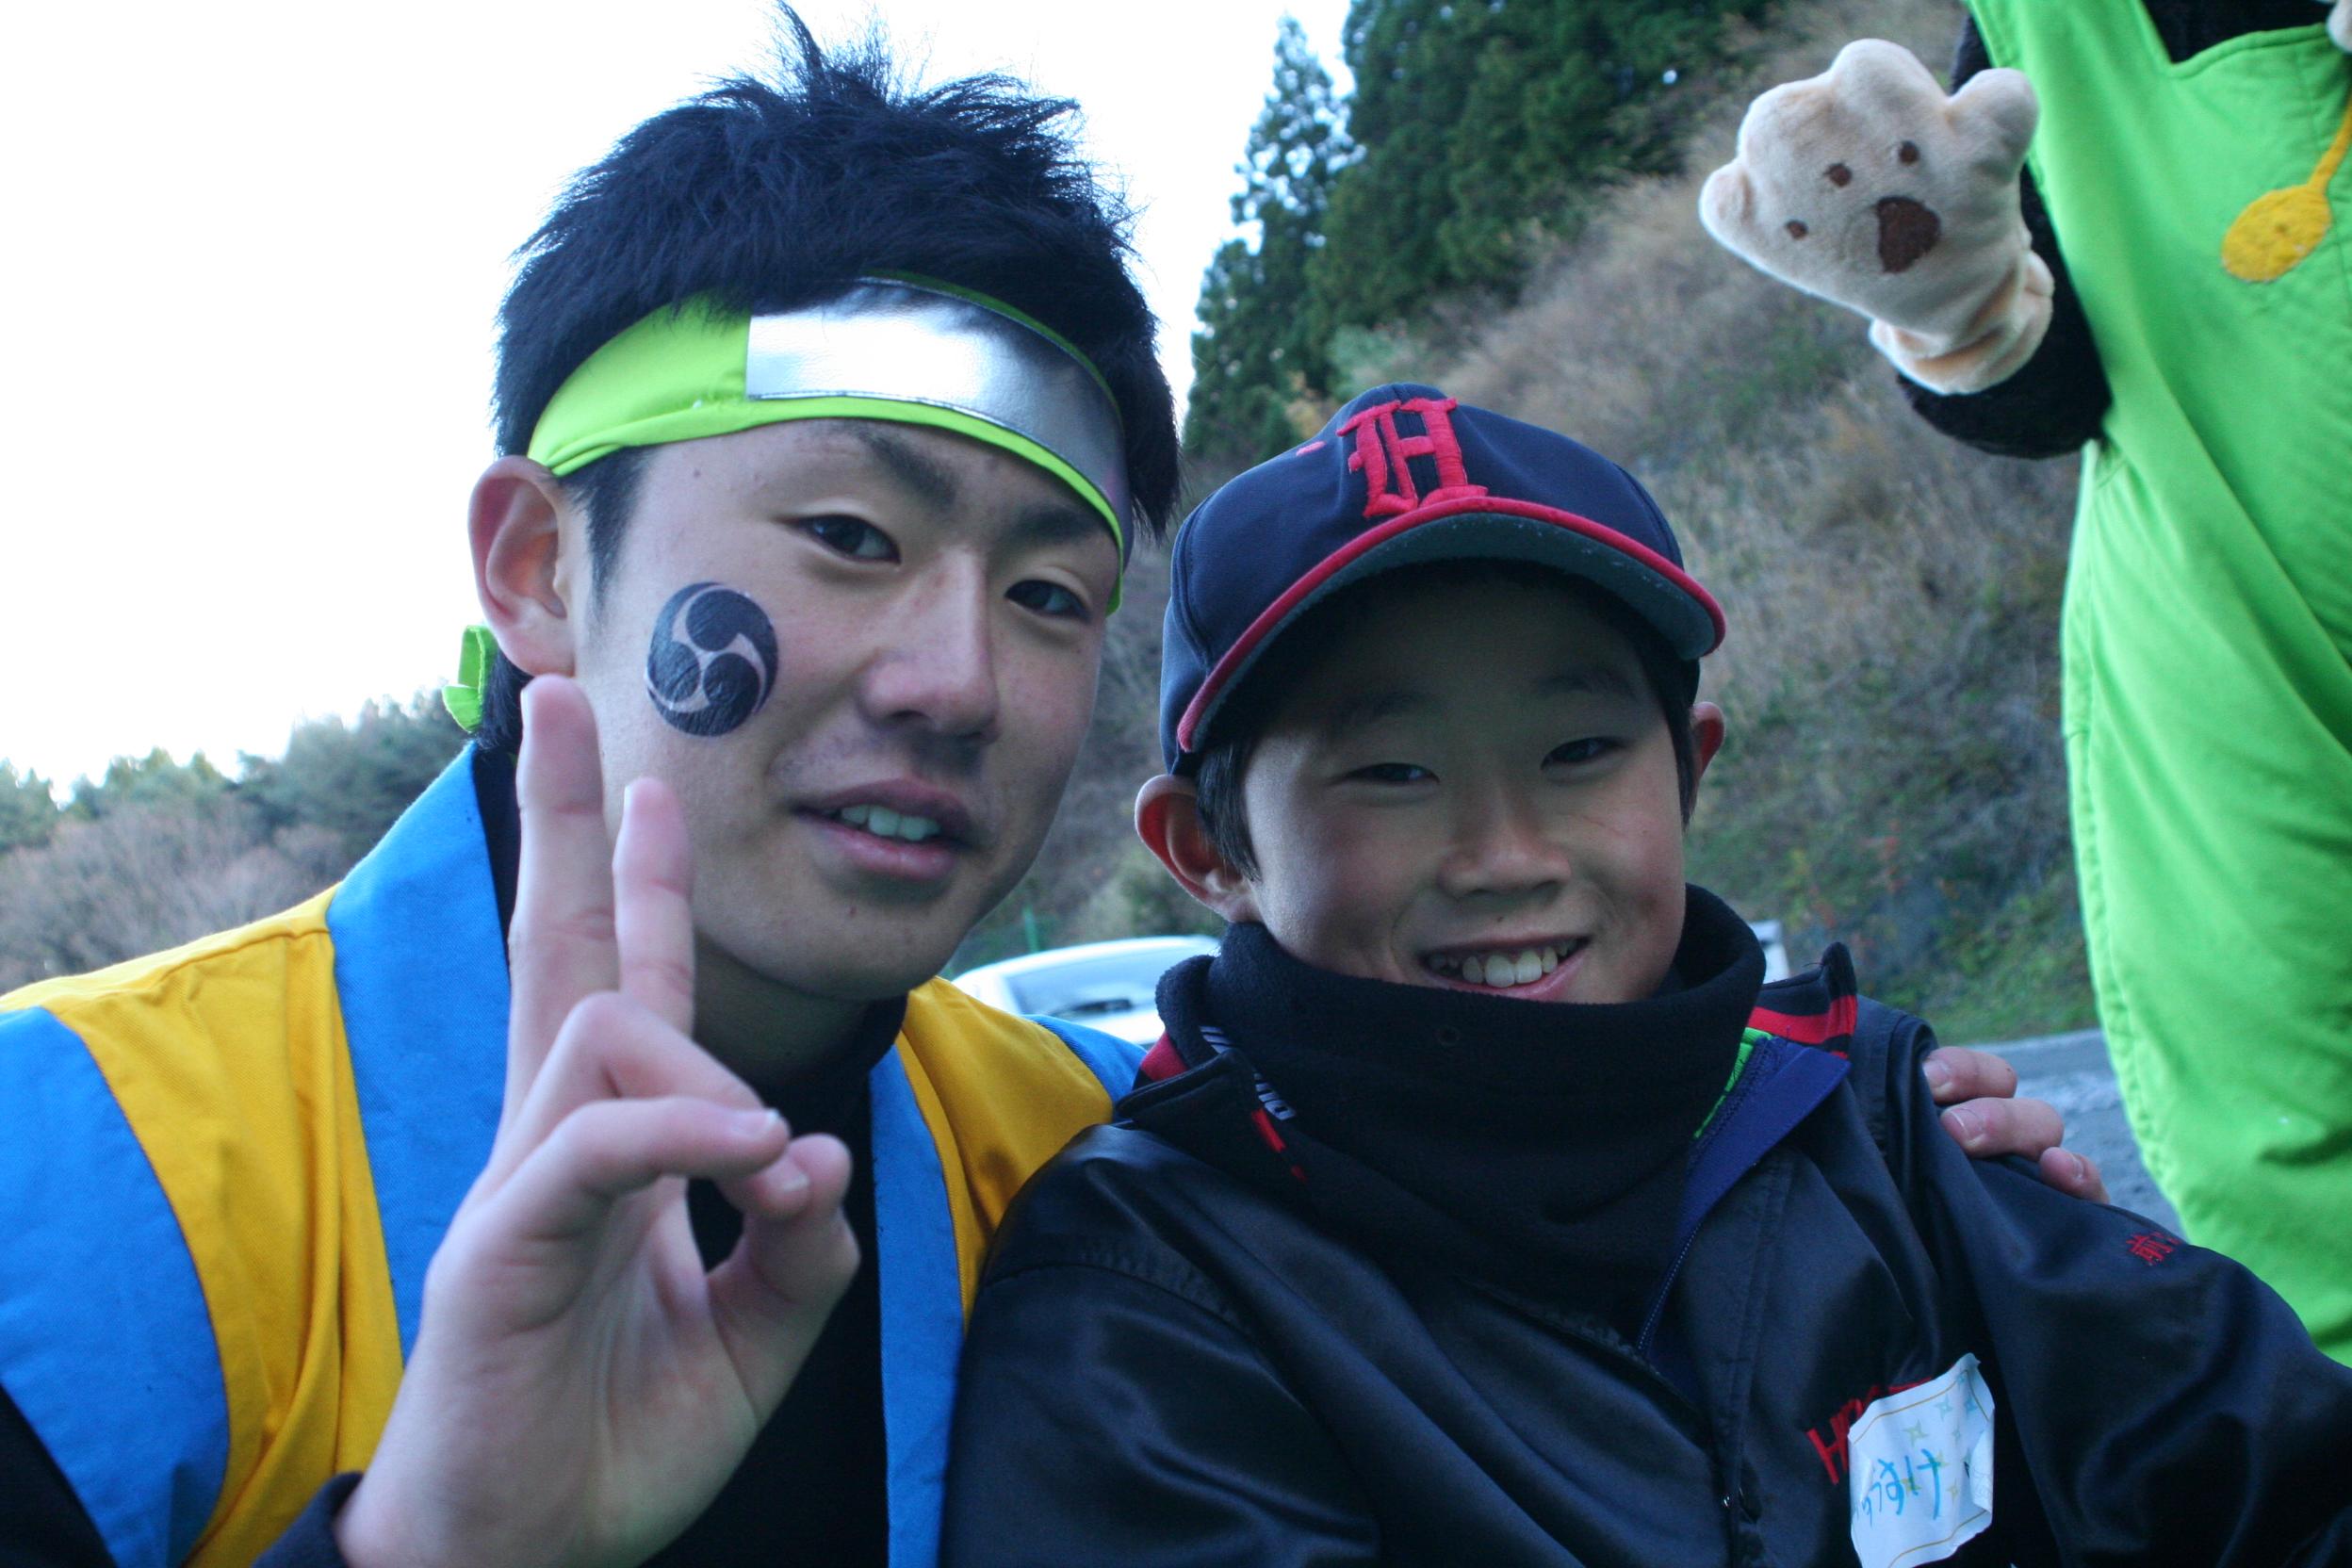 http://www.kickbackcafe.jp/support2/report/IMG_6076.JPG